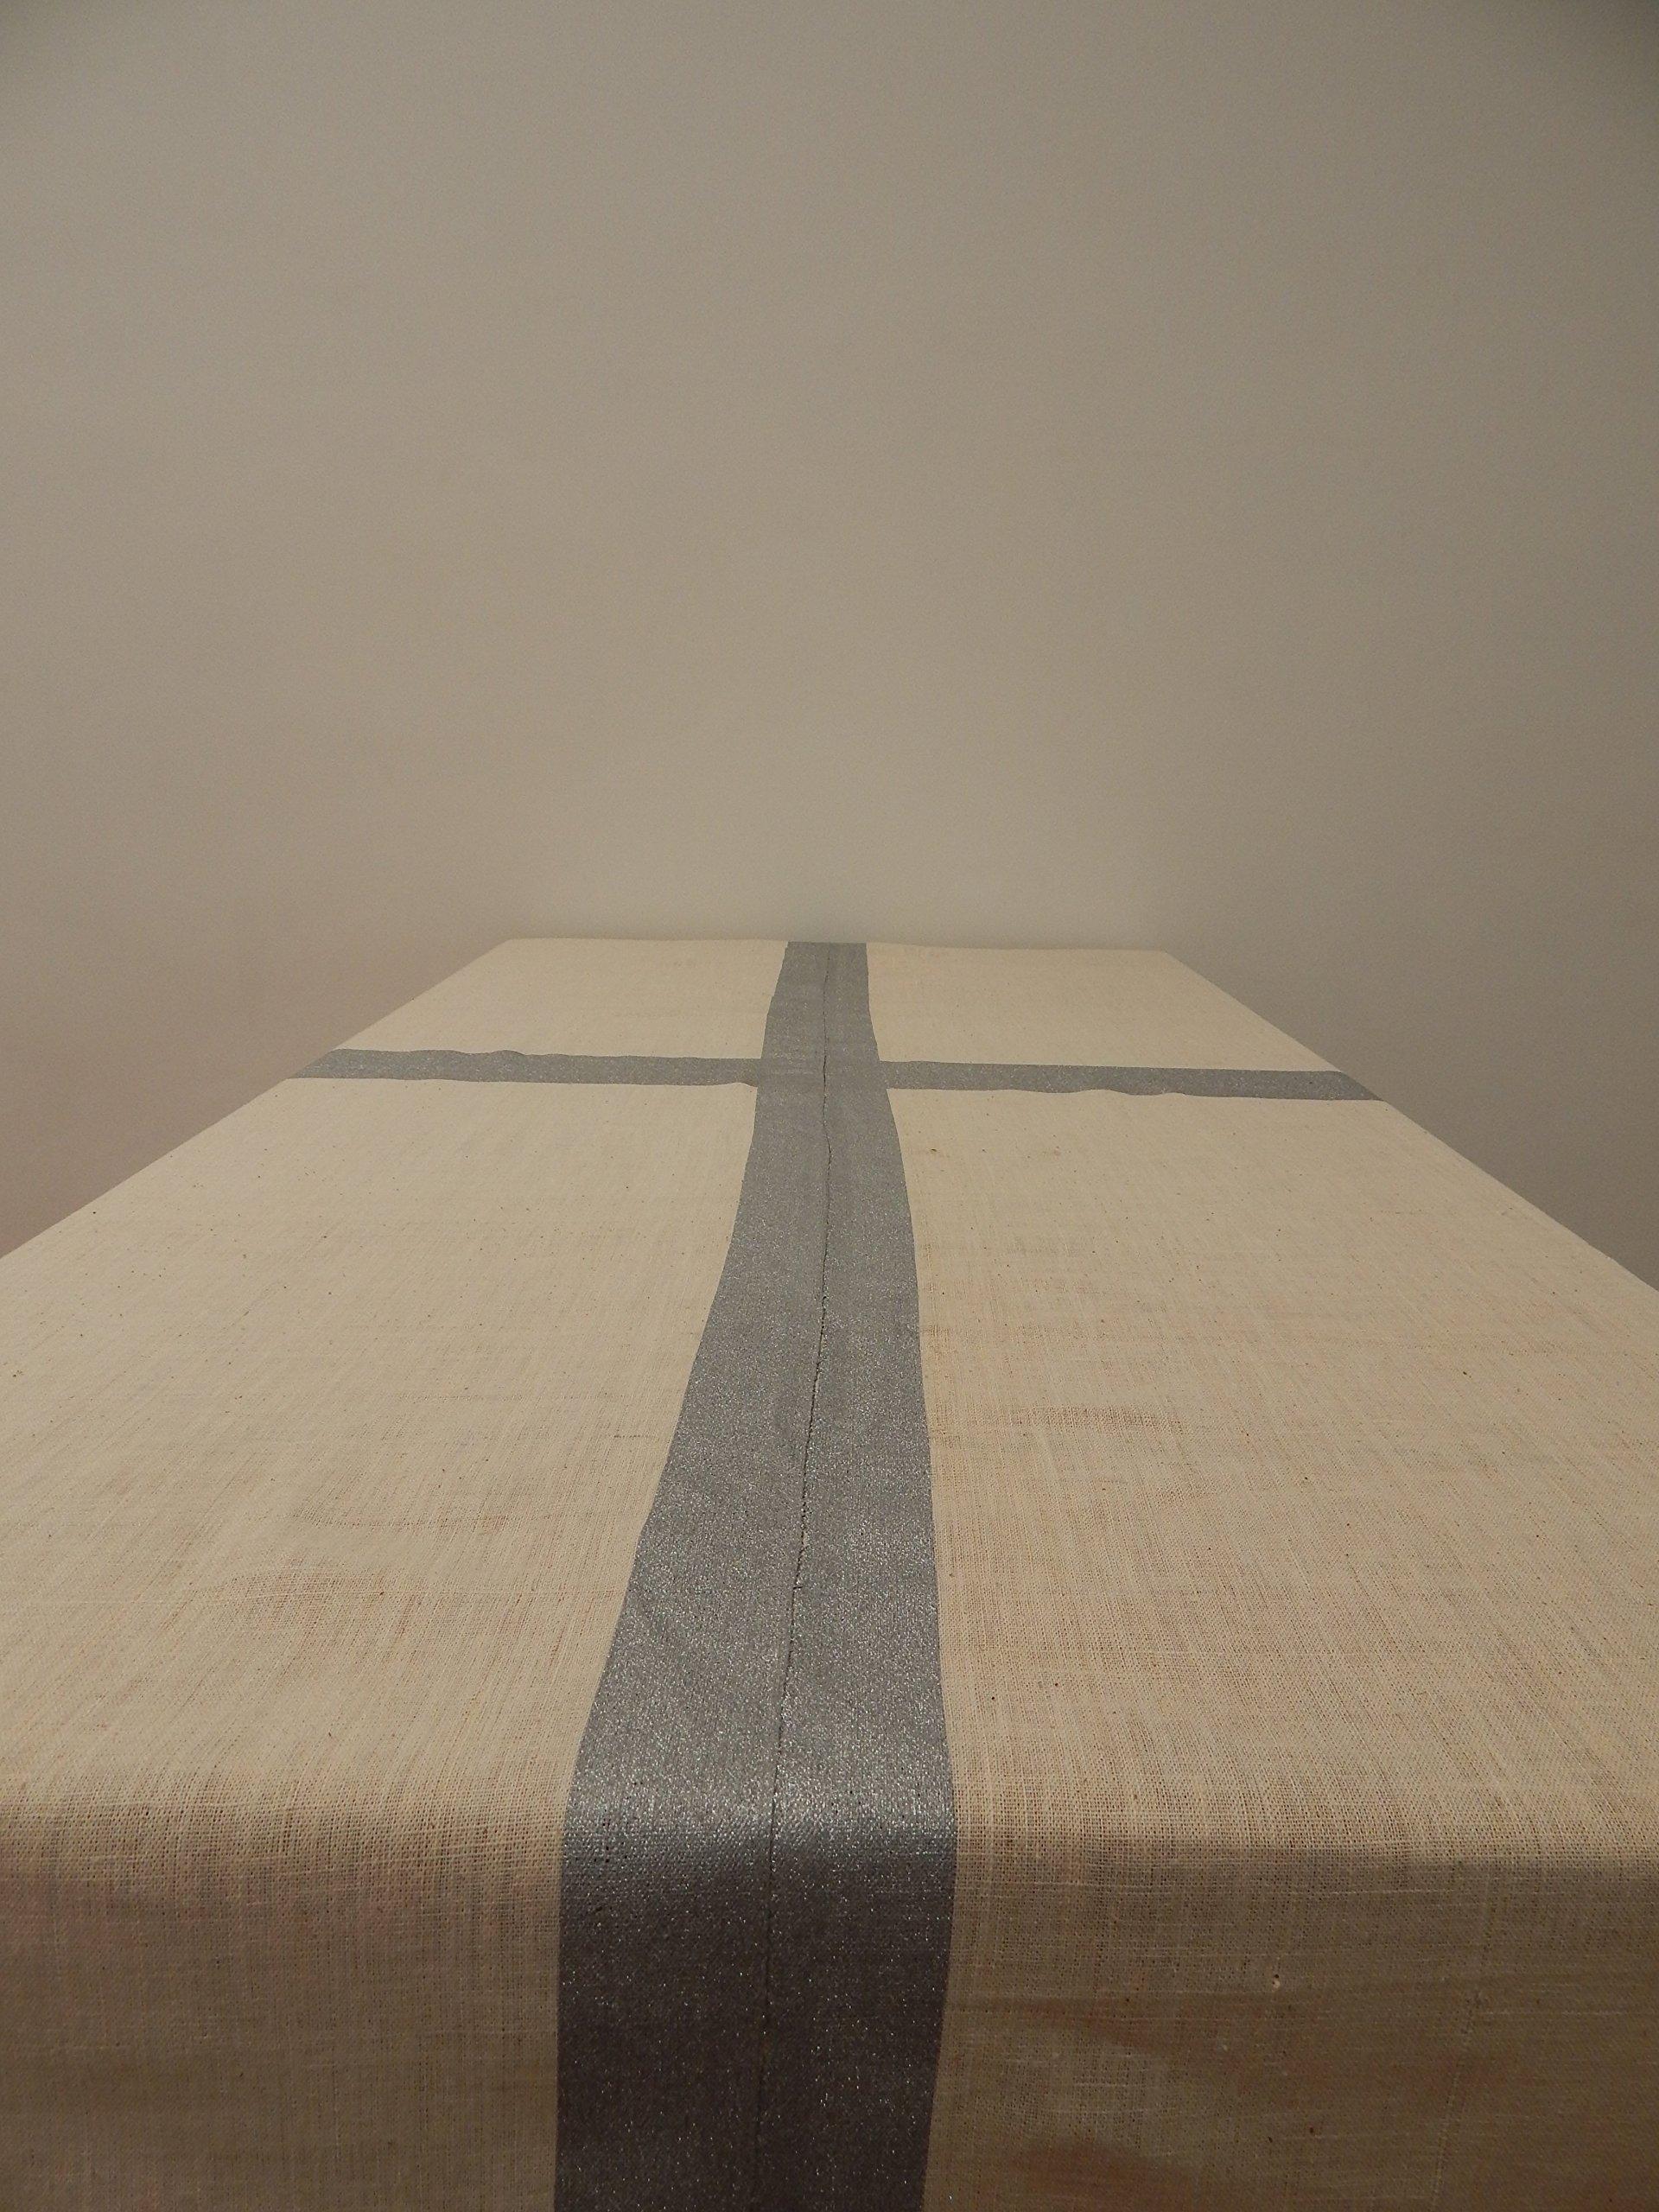 Gitika Goyal Home Cotton Khadi Silver Screen Printed Tablecloth with Border Design, Cream, 72'' x 72''